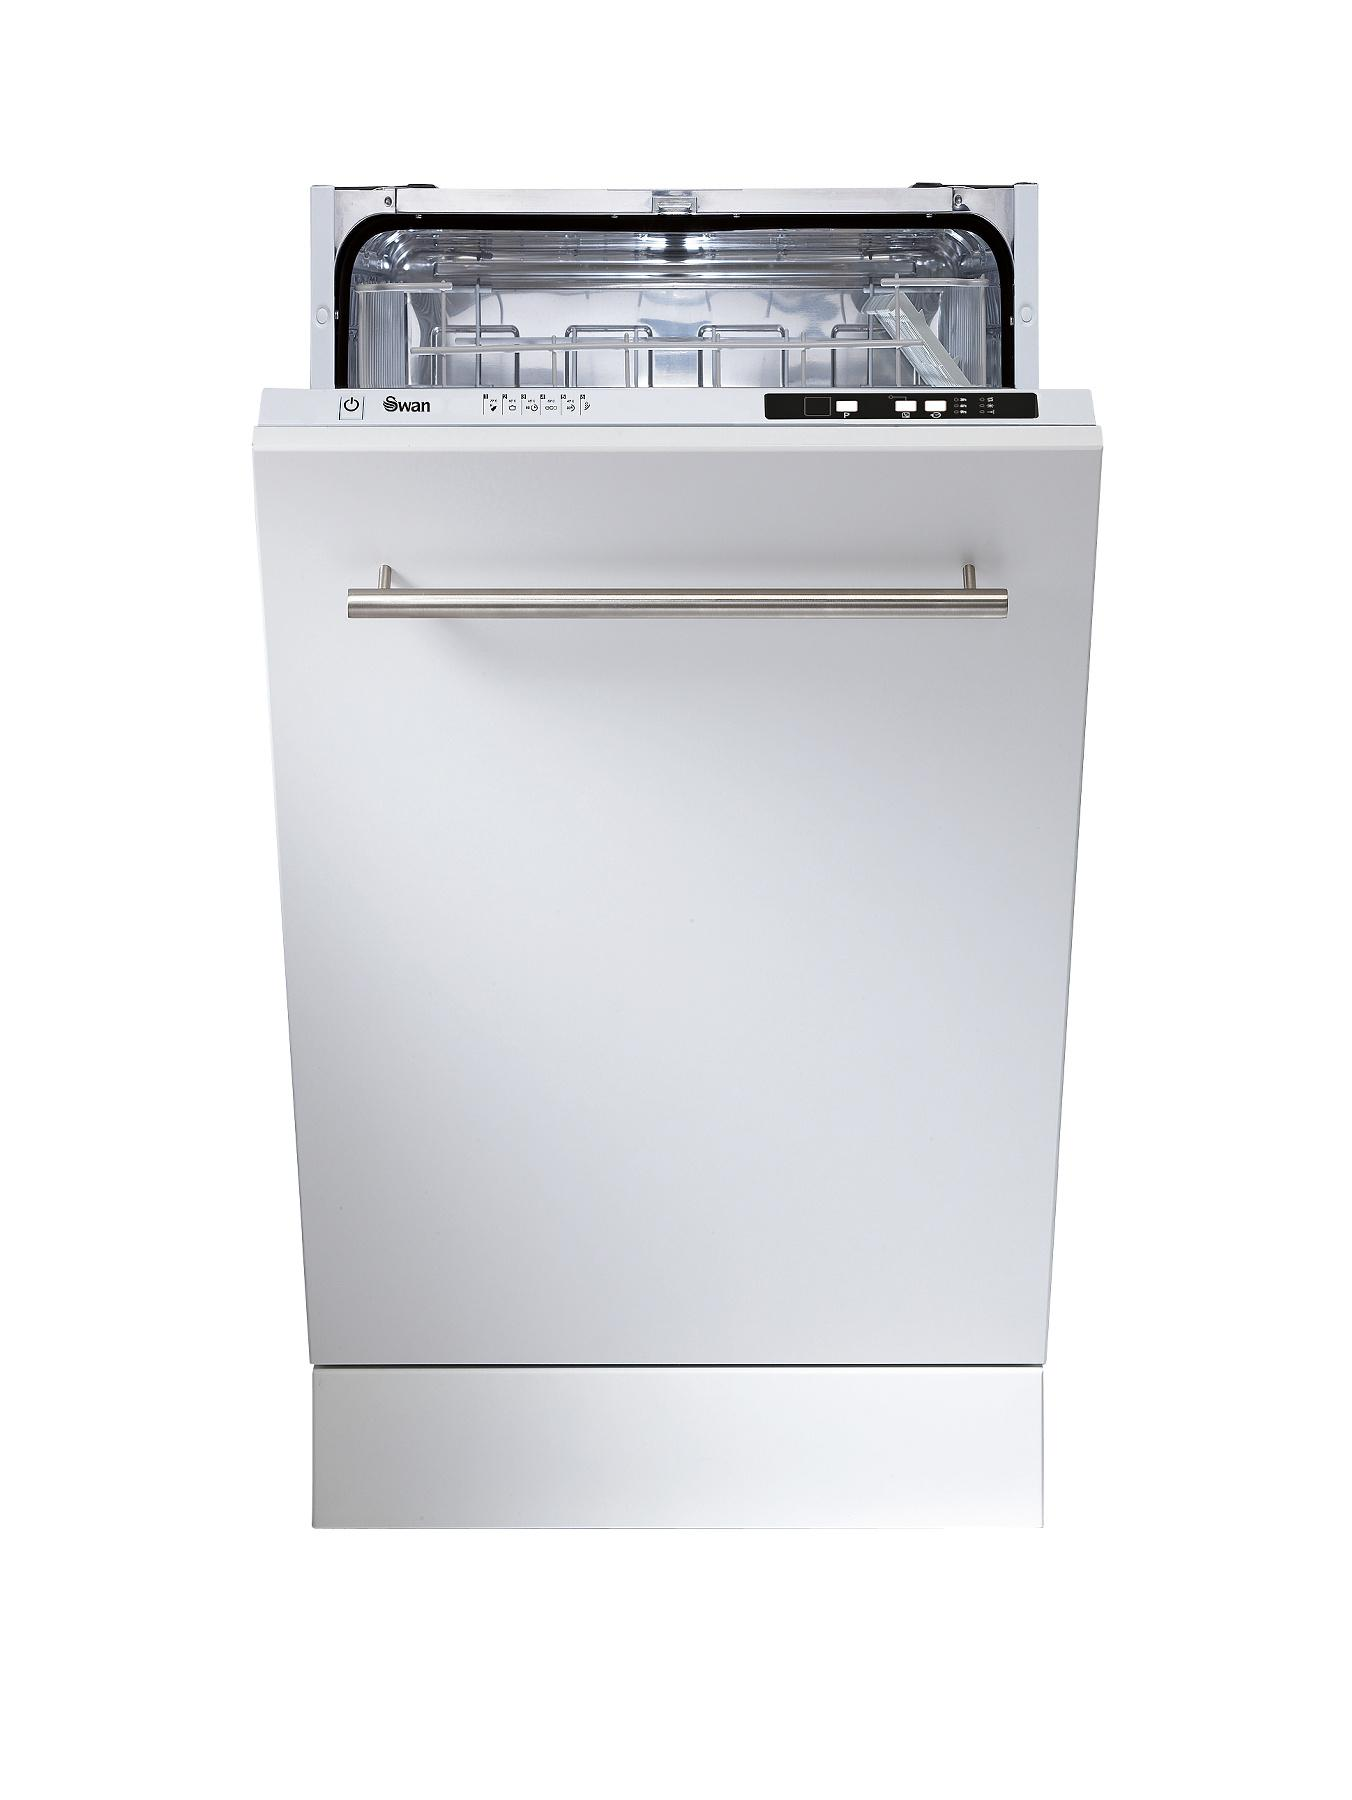 SDWB2010 10 Place Slimline Integrated Dishwasher - White at Littlewoods